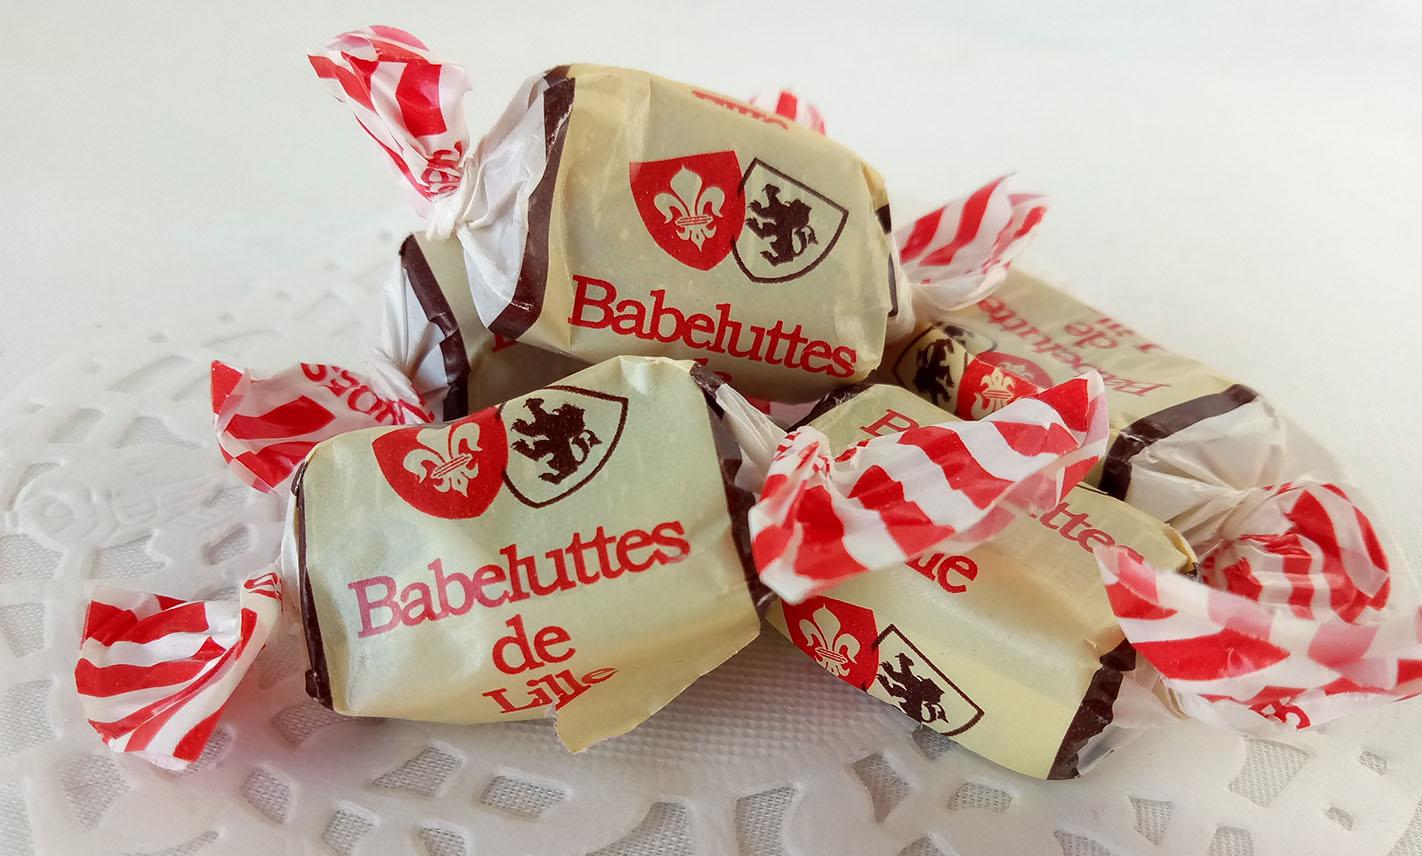 babeluttes-de-lille-allegee-2